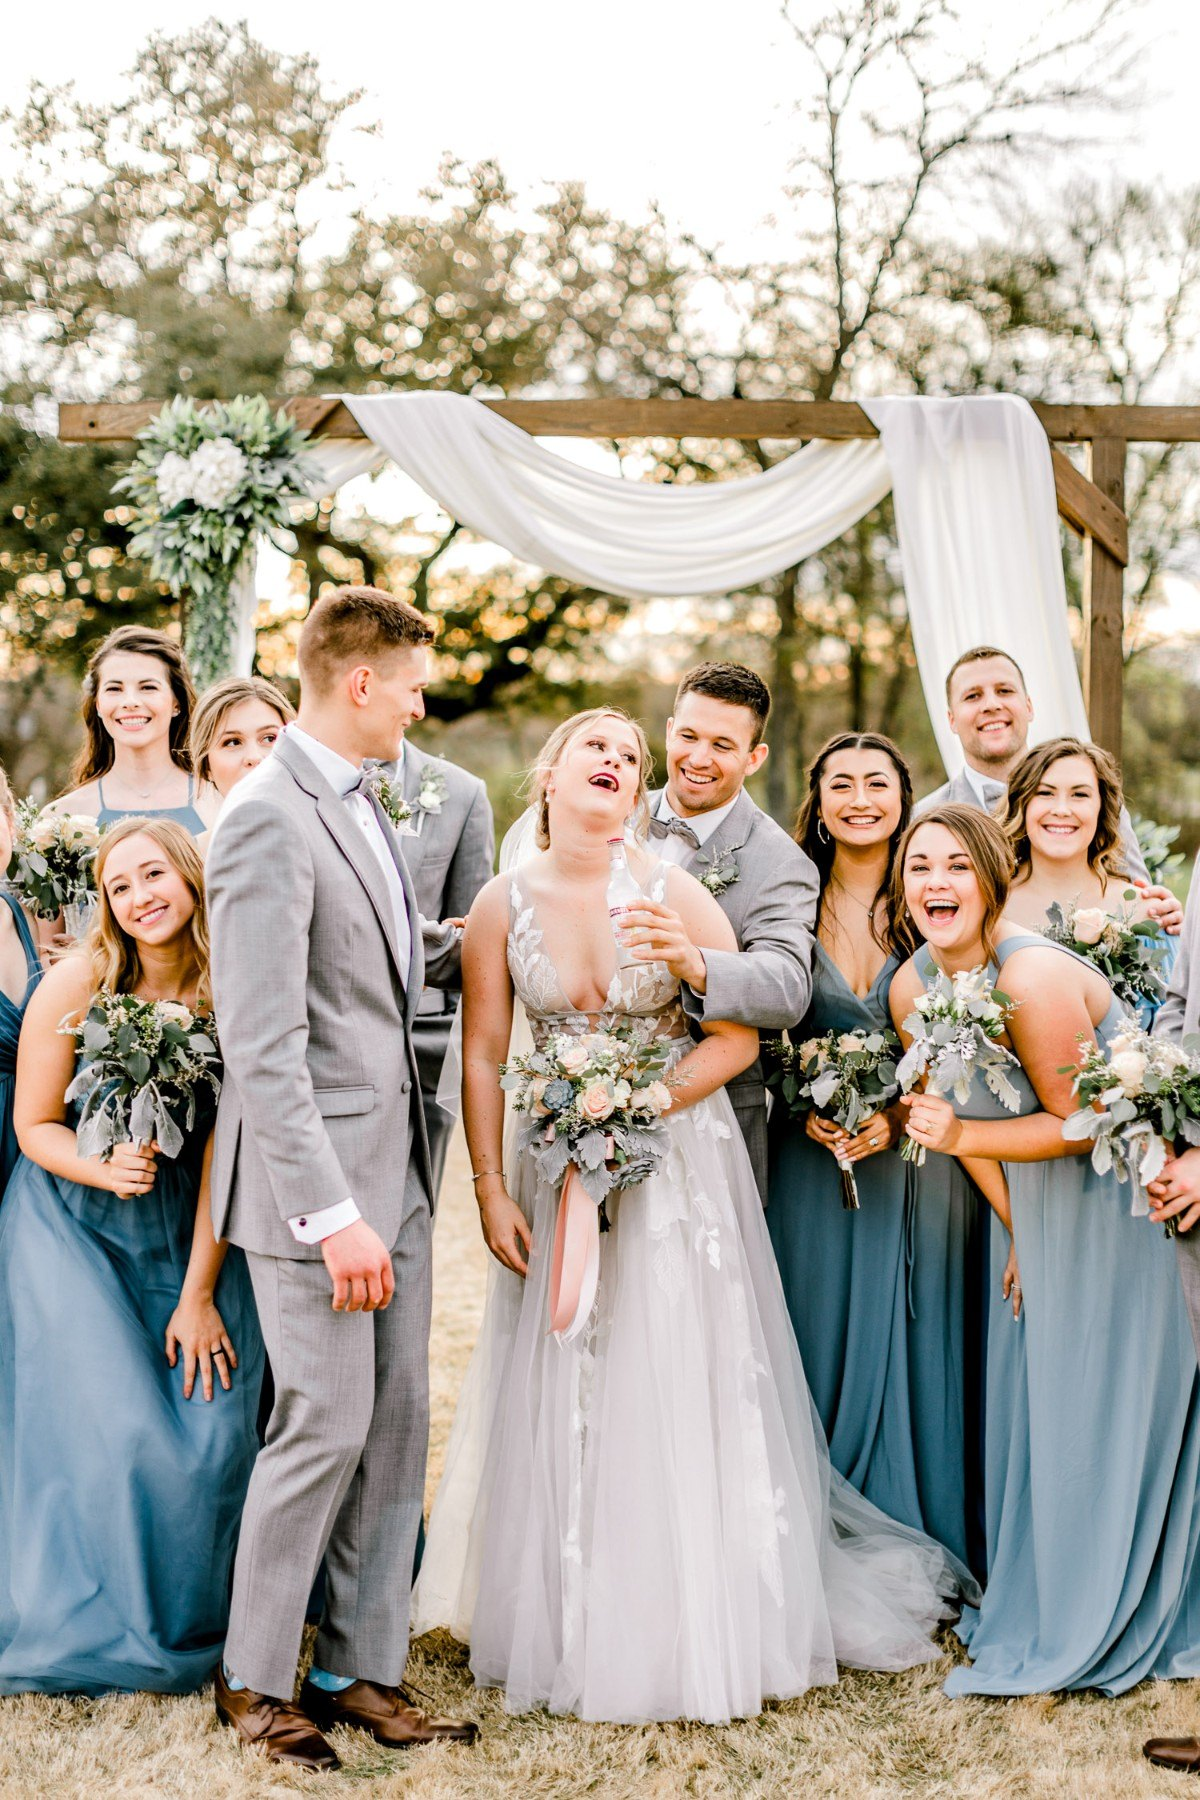 ennis-texas-wedding-photographer-kaitlyn-bullard-95.jpg